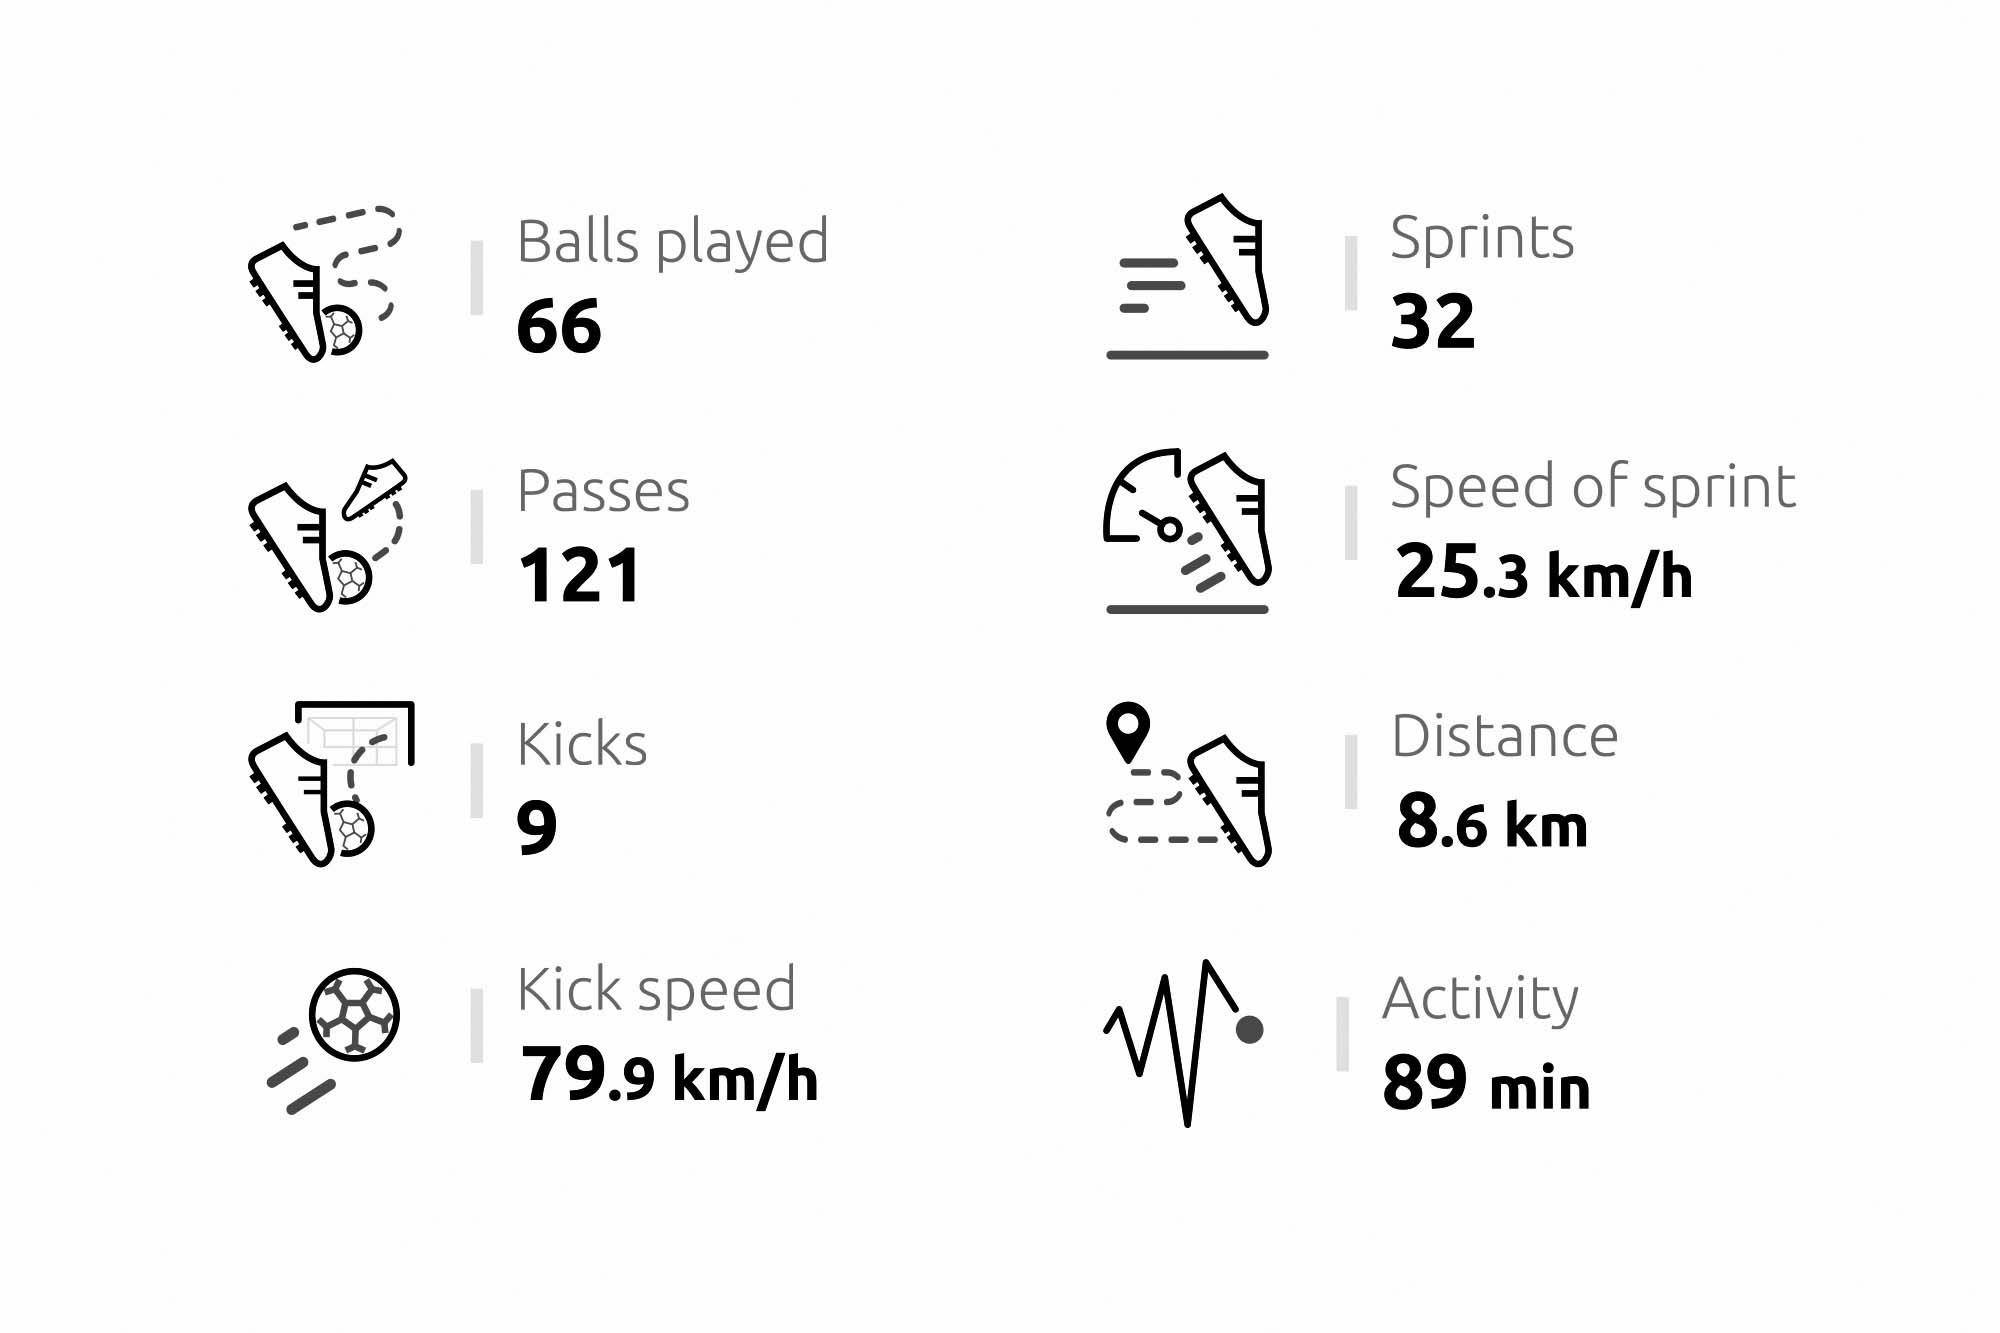 Soccer Statistics Icons 2